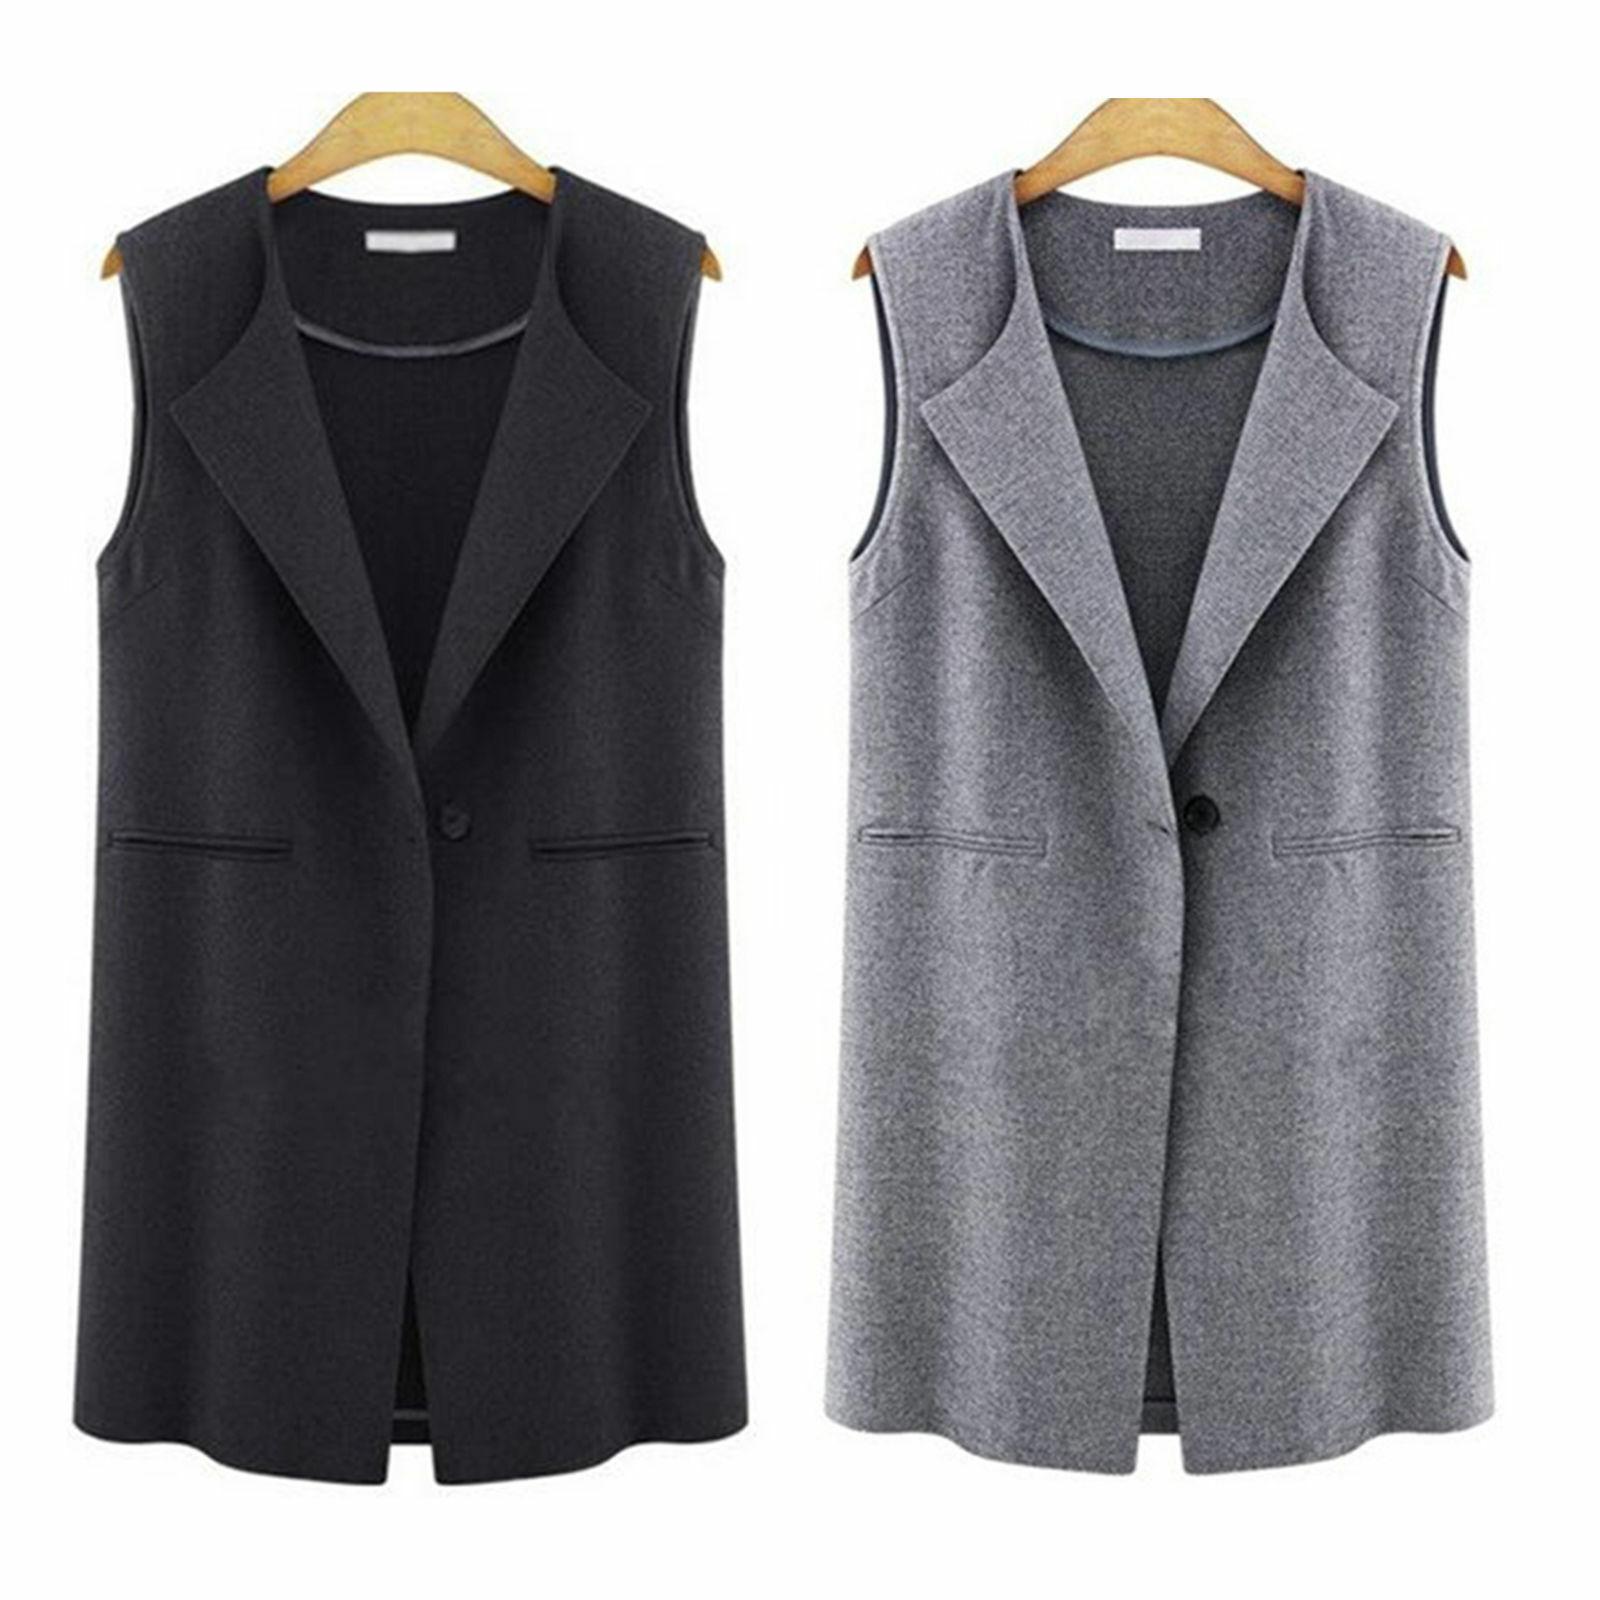 Womens Casual Waistcoat Vest Sleeveless Lapel Cardigan Jacke